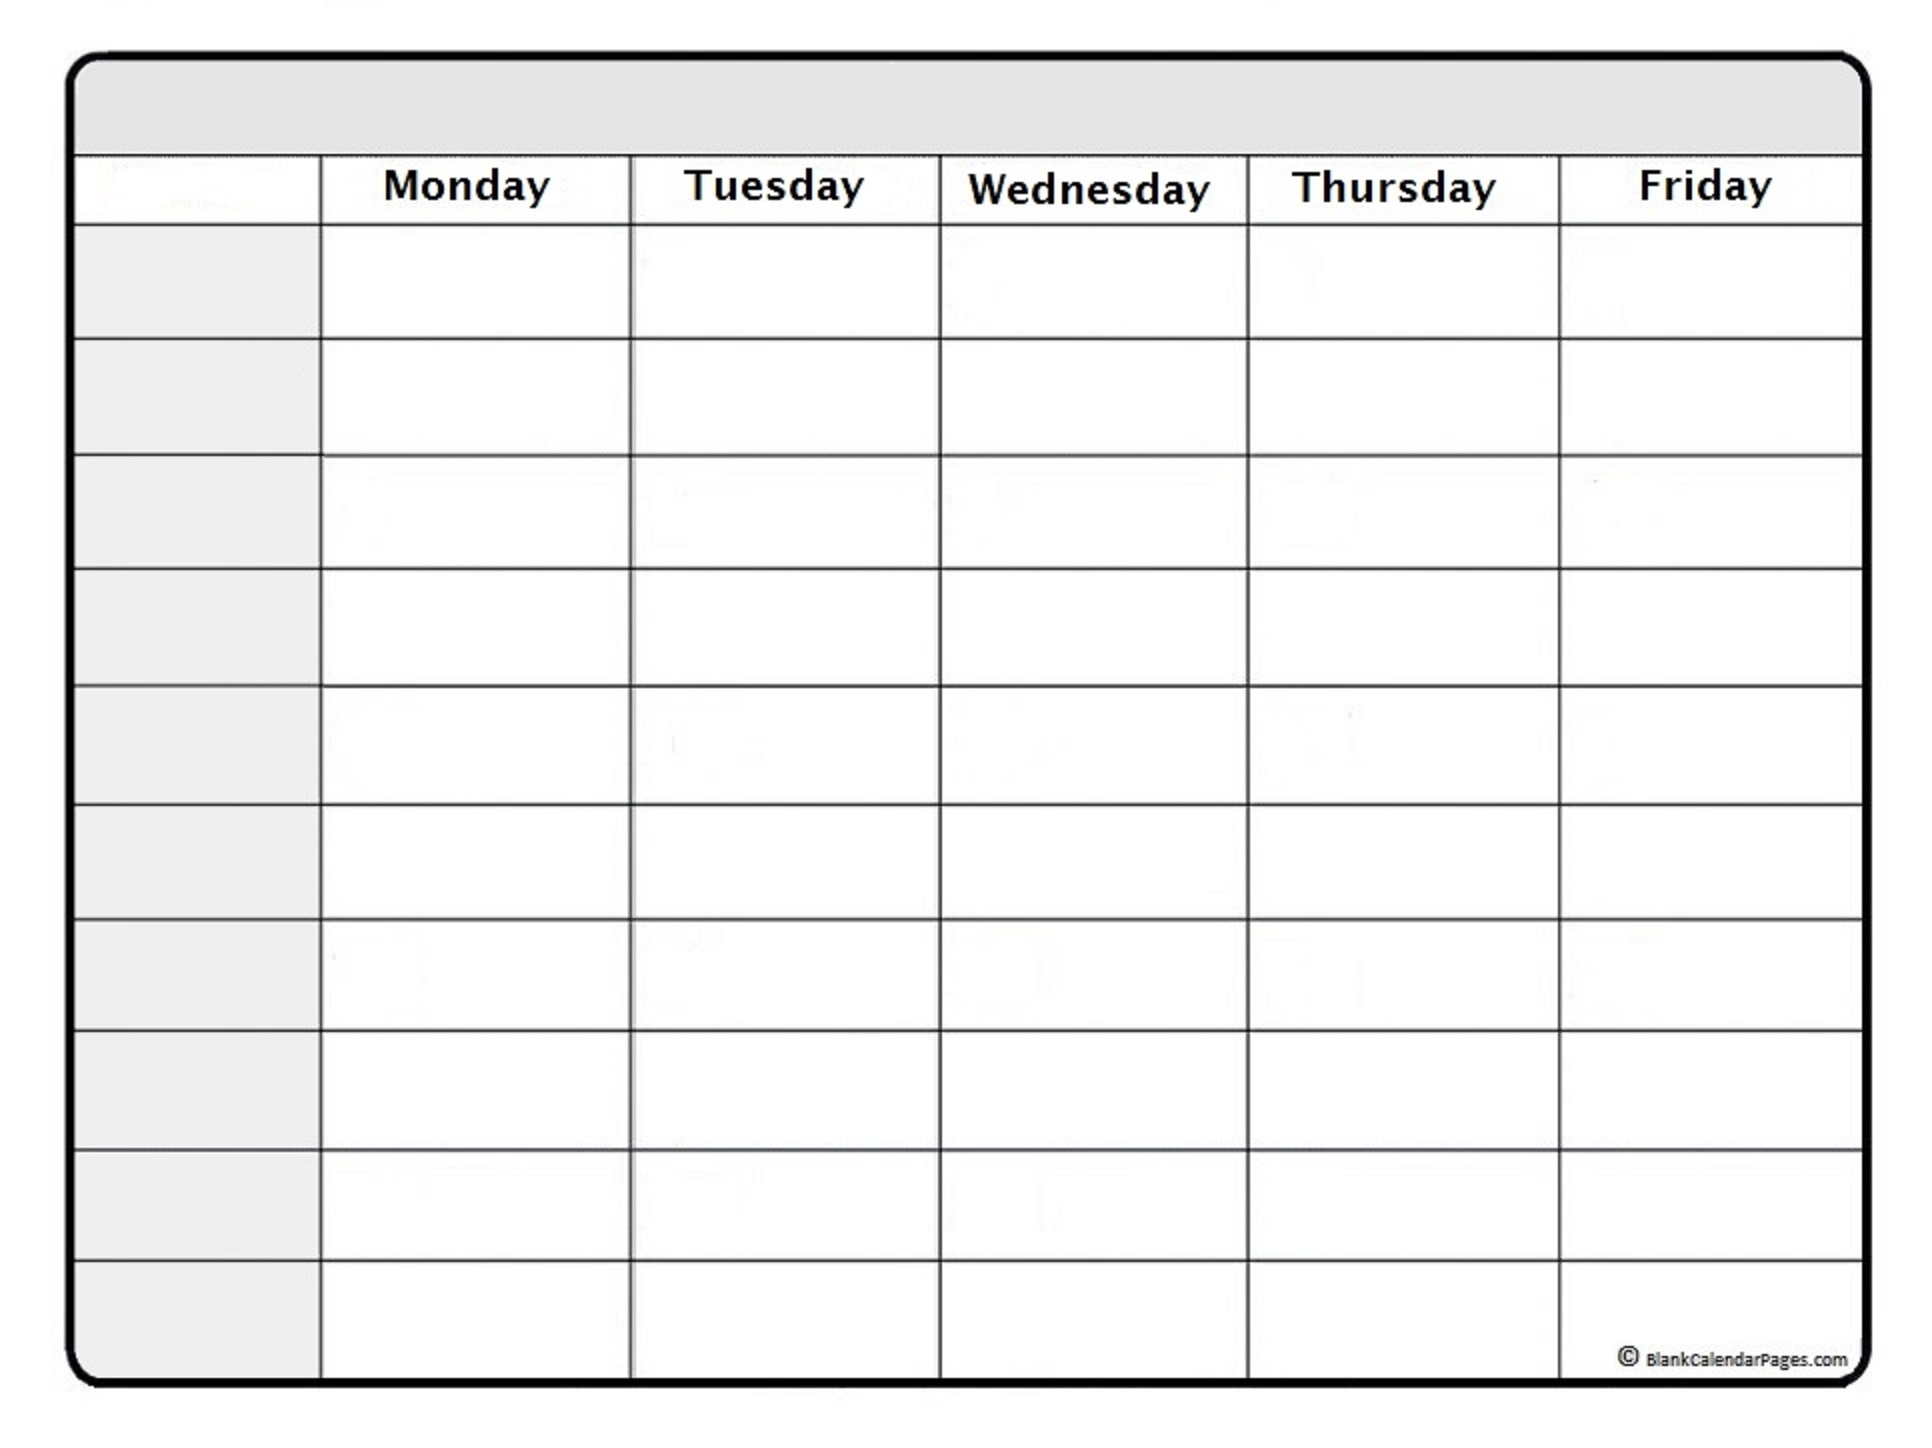 May 2020 Weekly Calendar | May 2020 Weekly Calendar Template